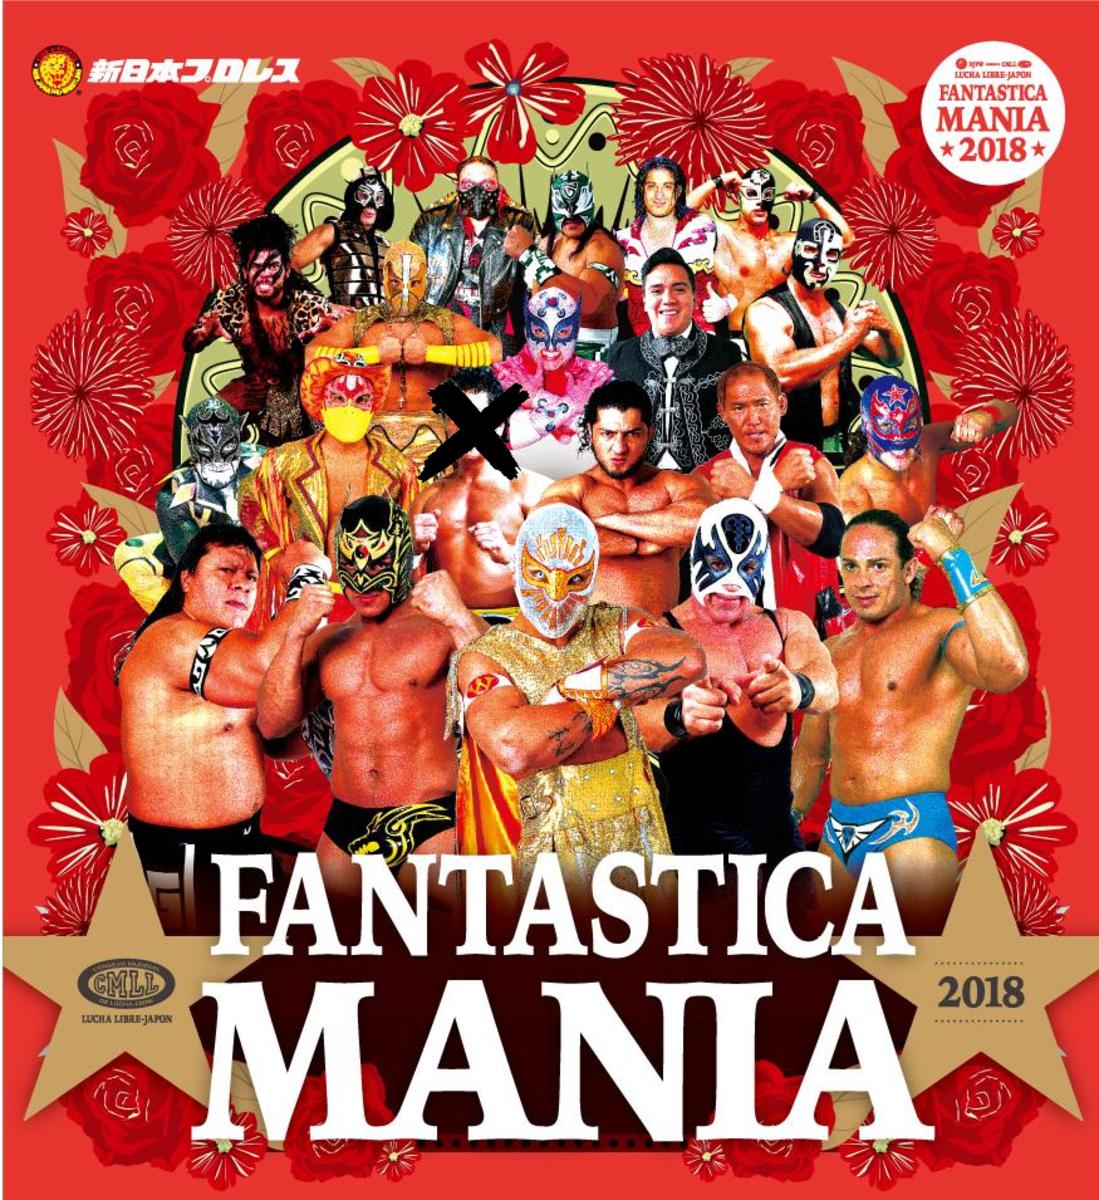 FantasticaMania 2018 Night Three (or Eight) Review